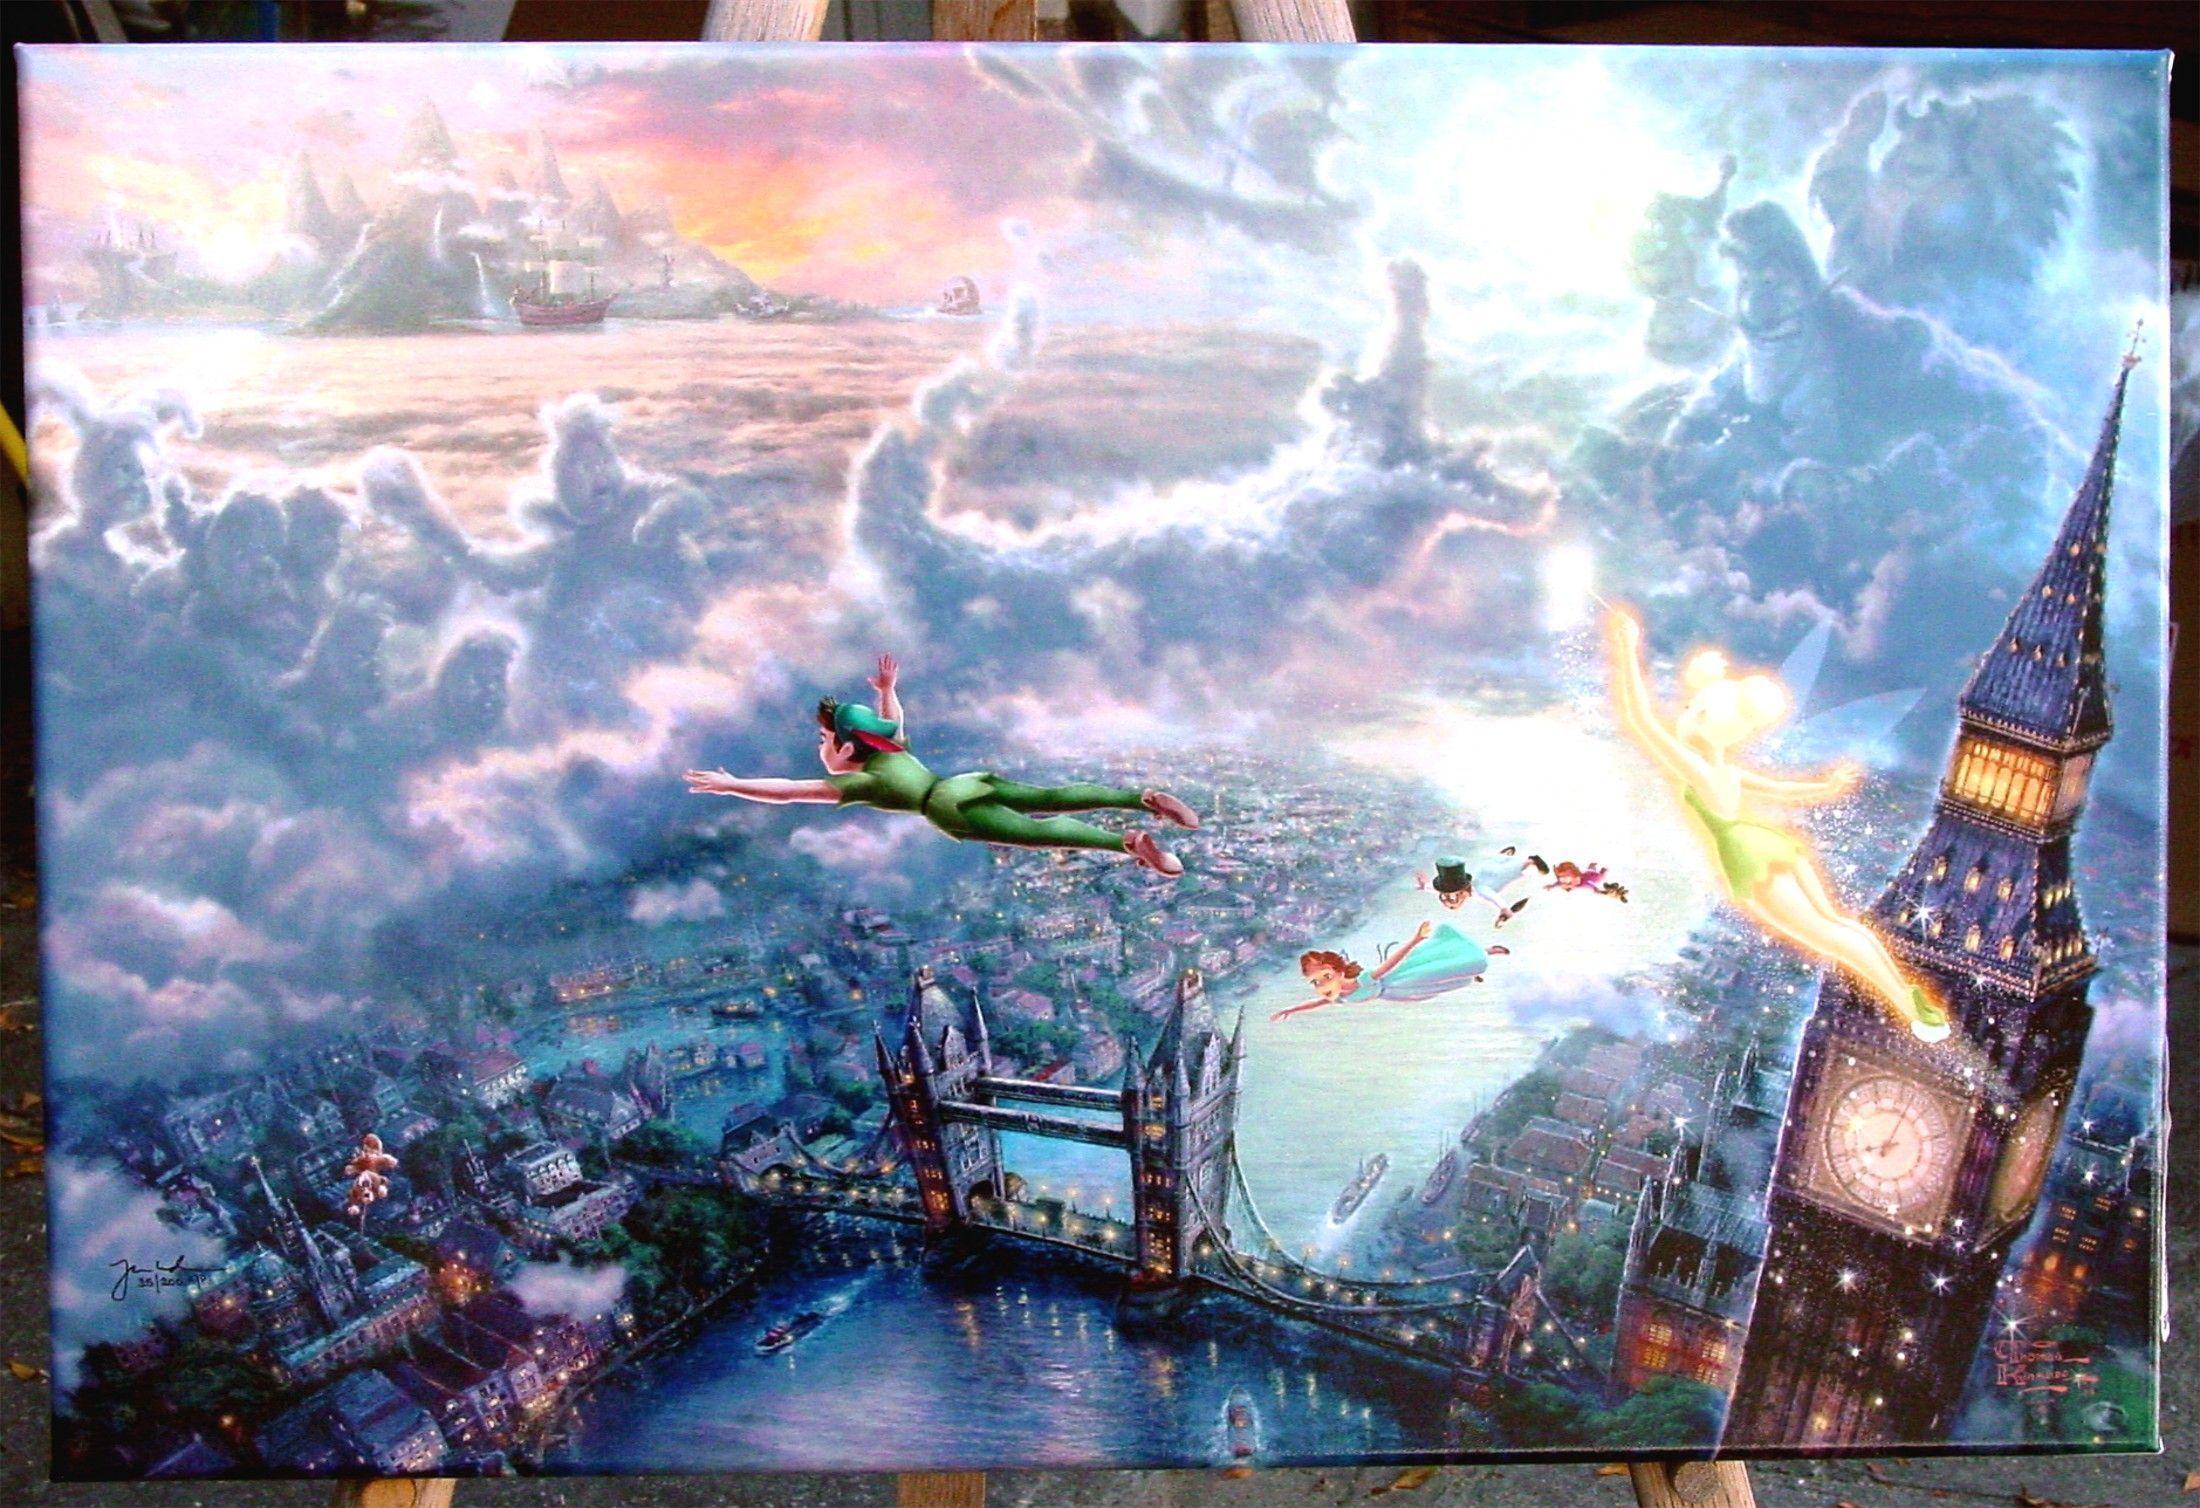 winter wonderland wallpaper desktop